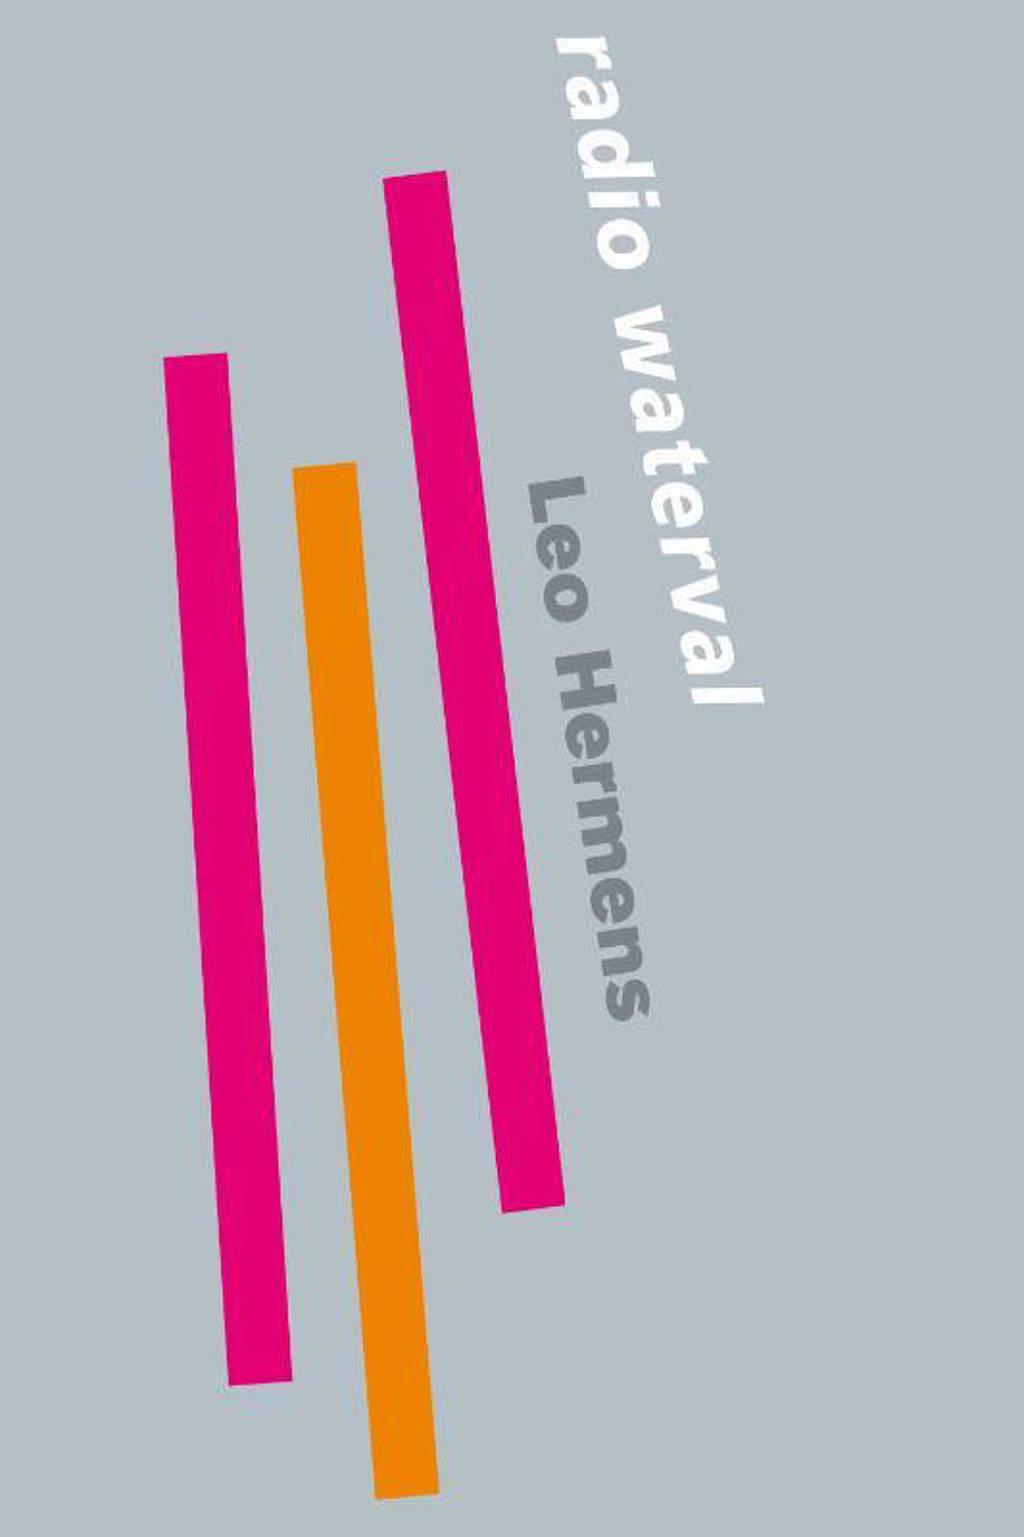 Radio waterval - Leo Hermens